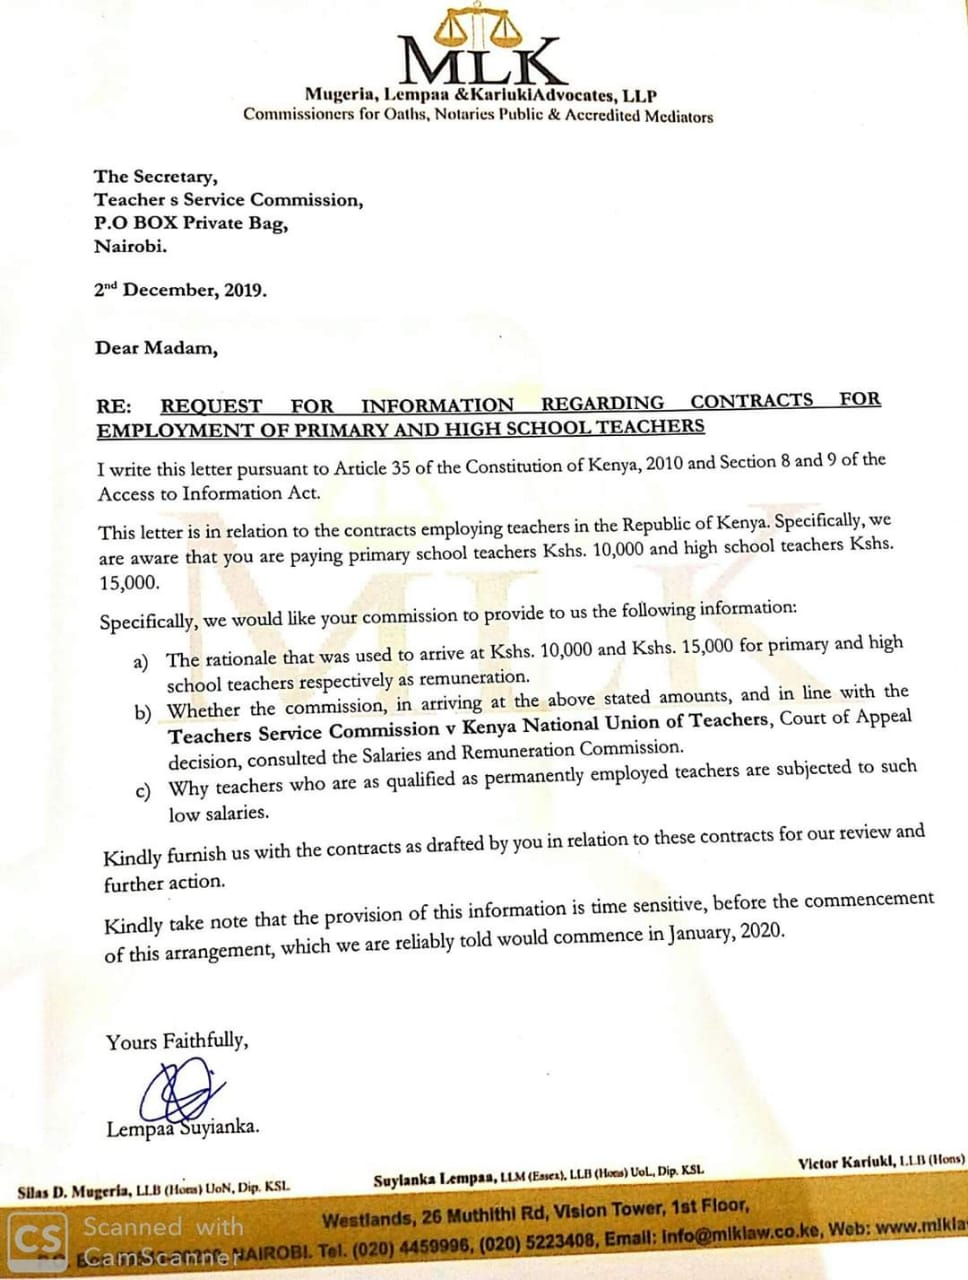 Mugeria, Lempaa and Kariuki Advocates' letter to TSC over employment of intern teachers.